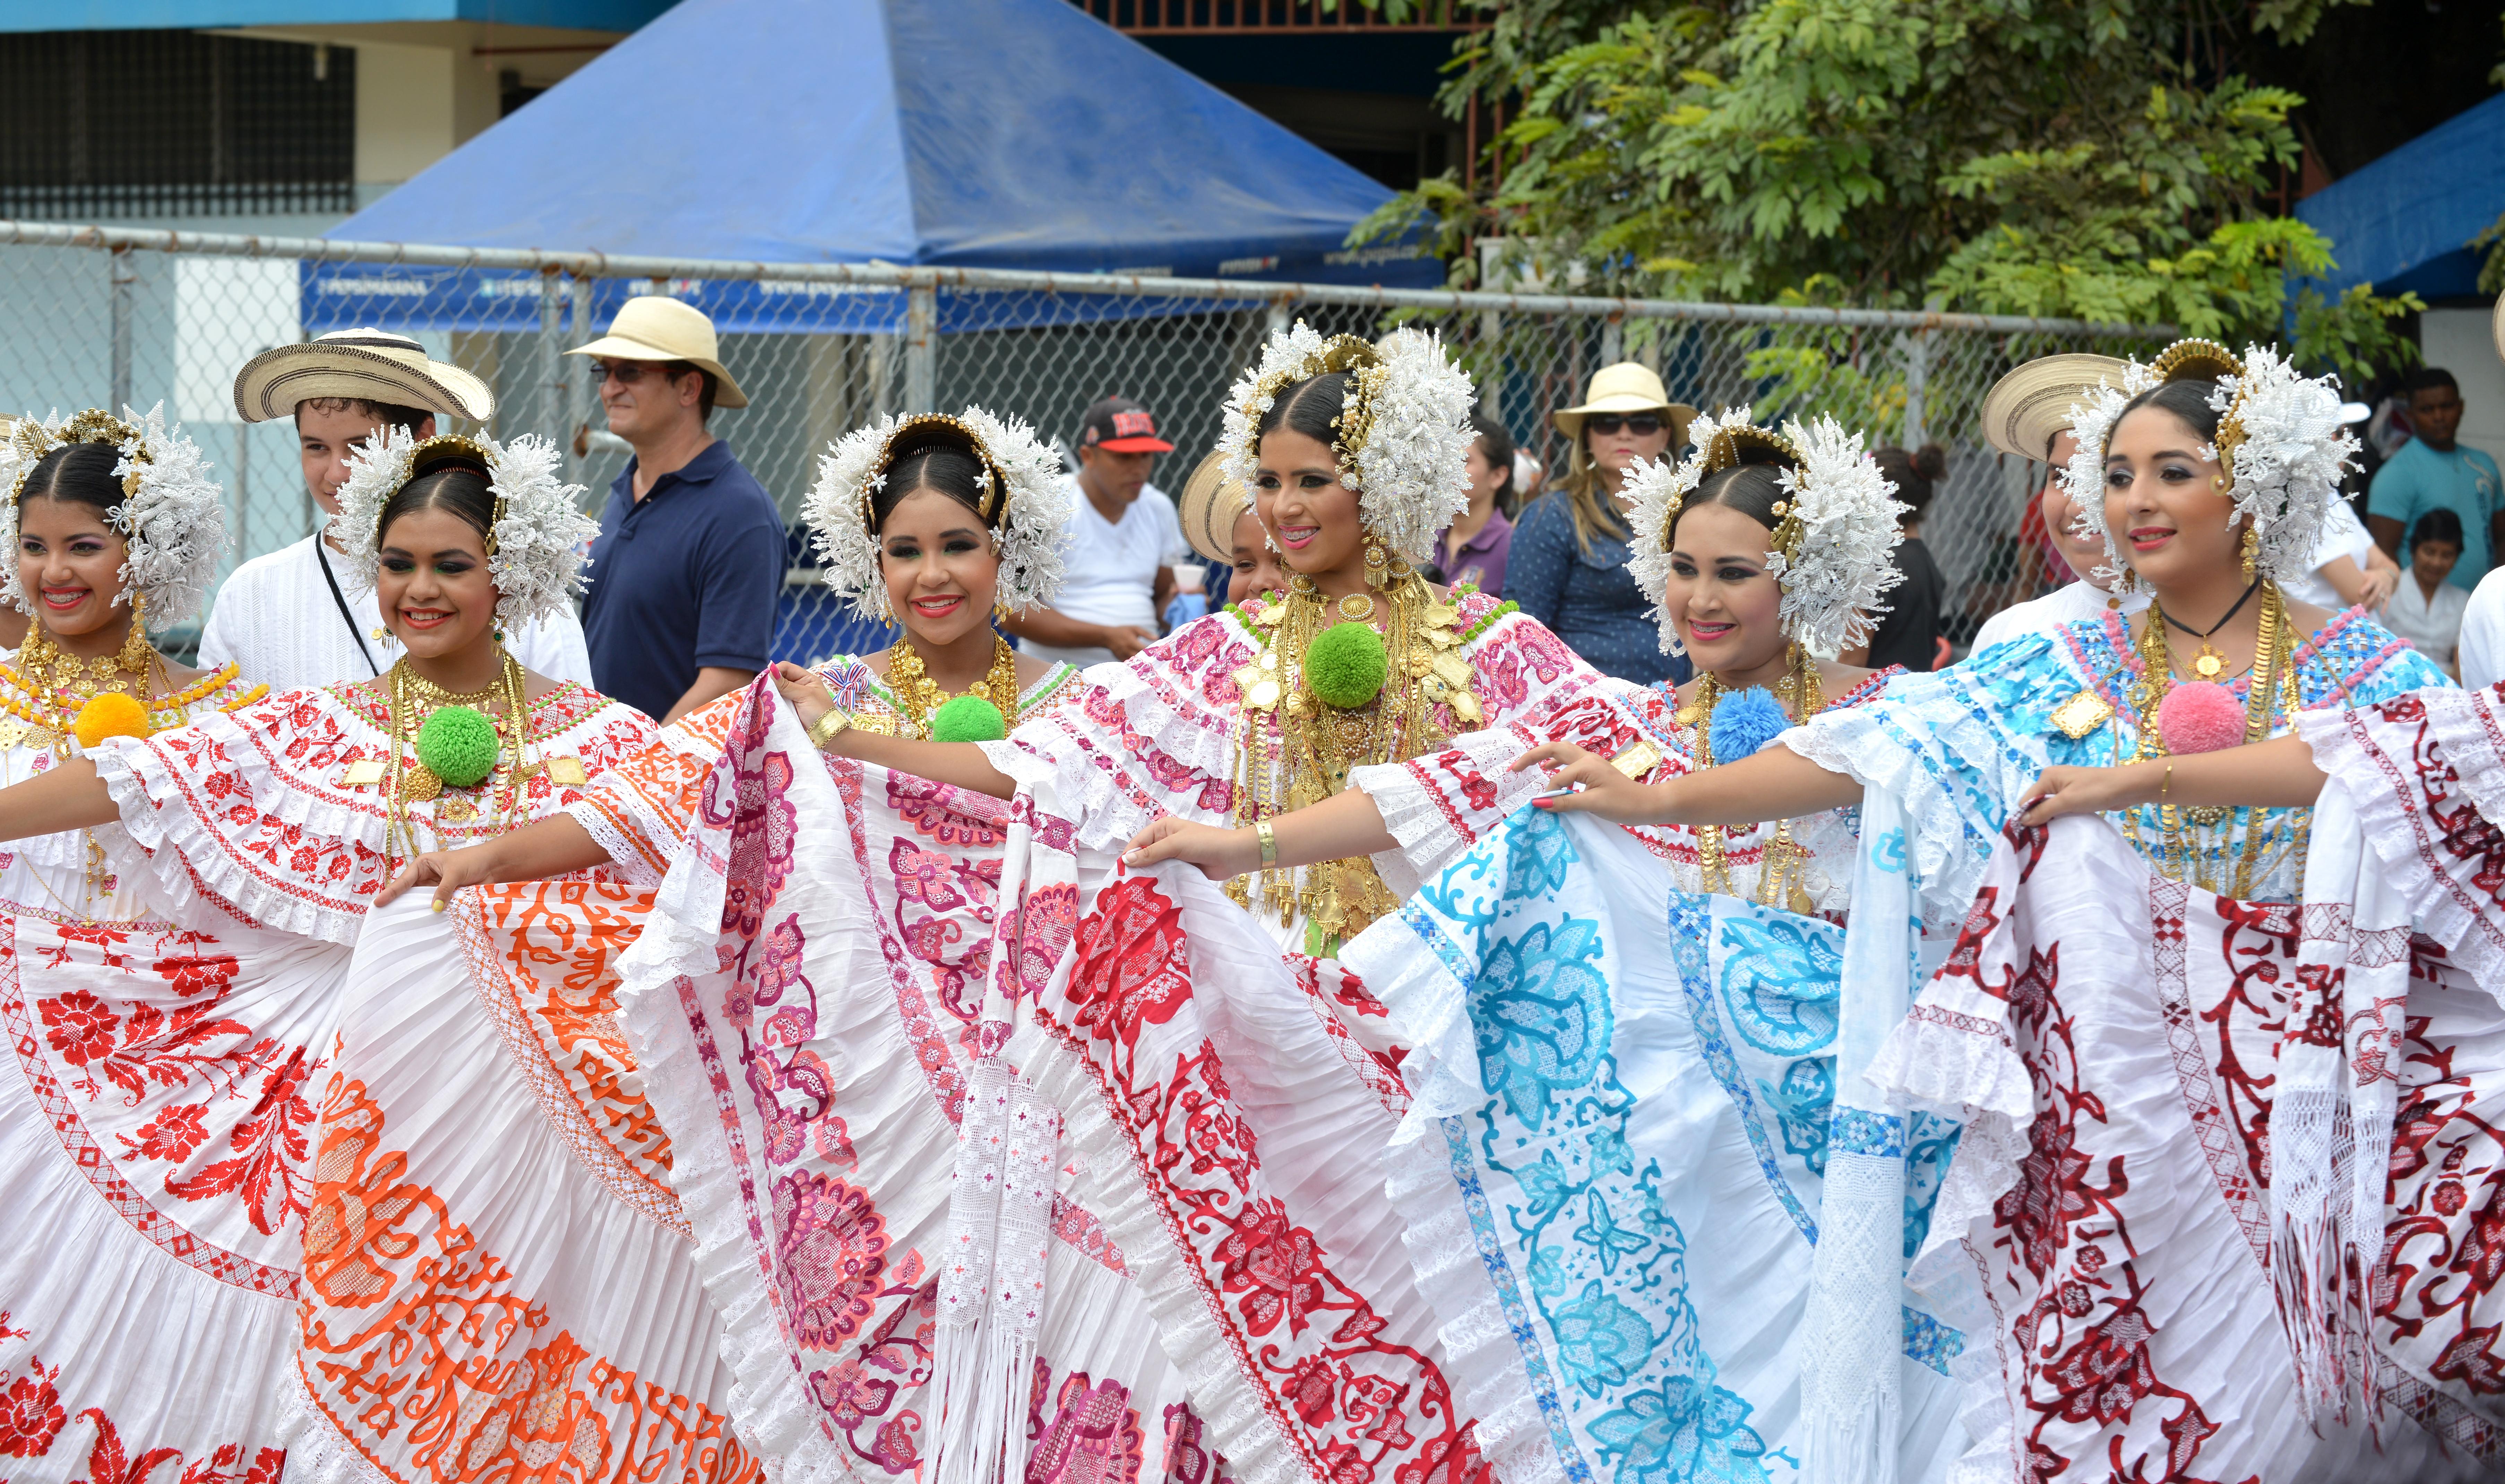 Las Tablas Carnival via Shutterstock